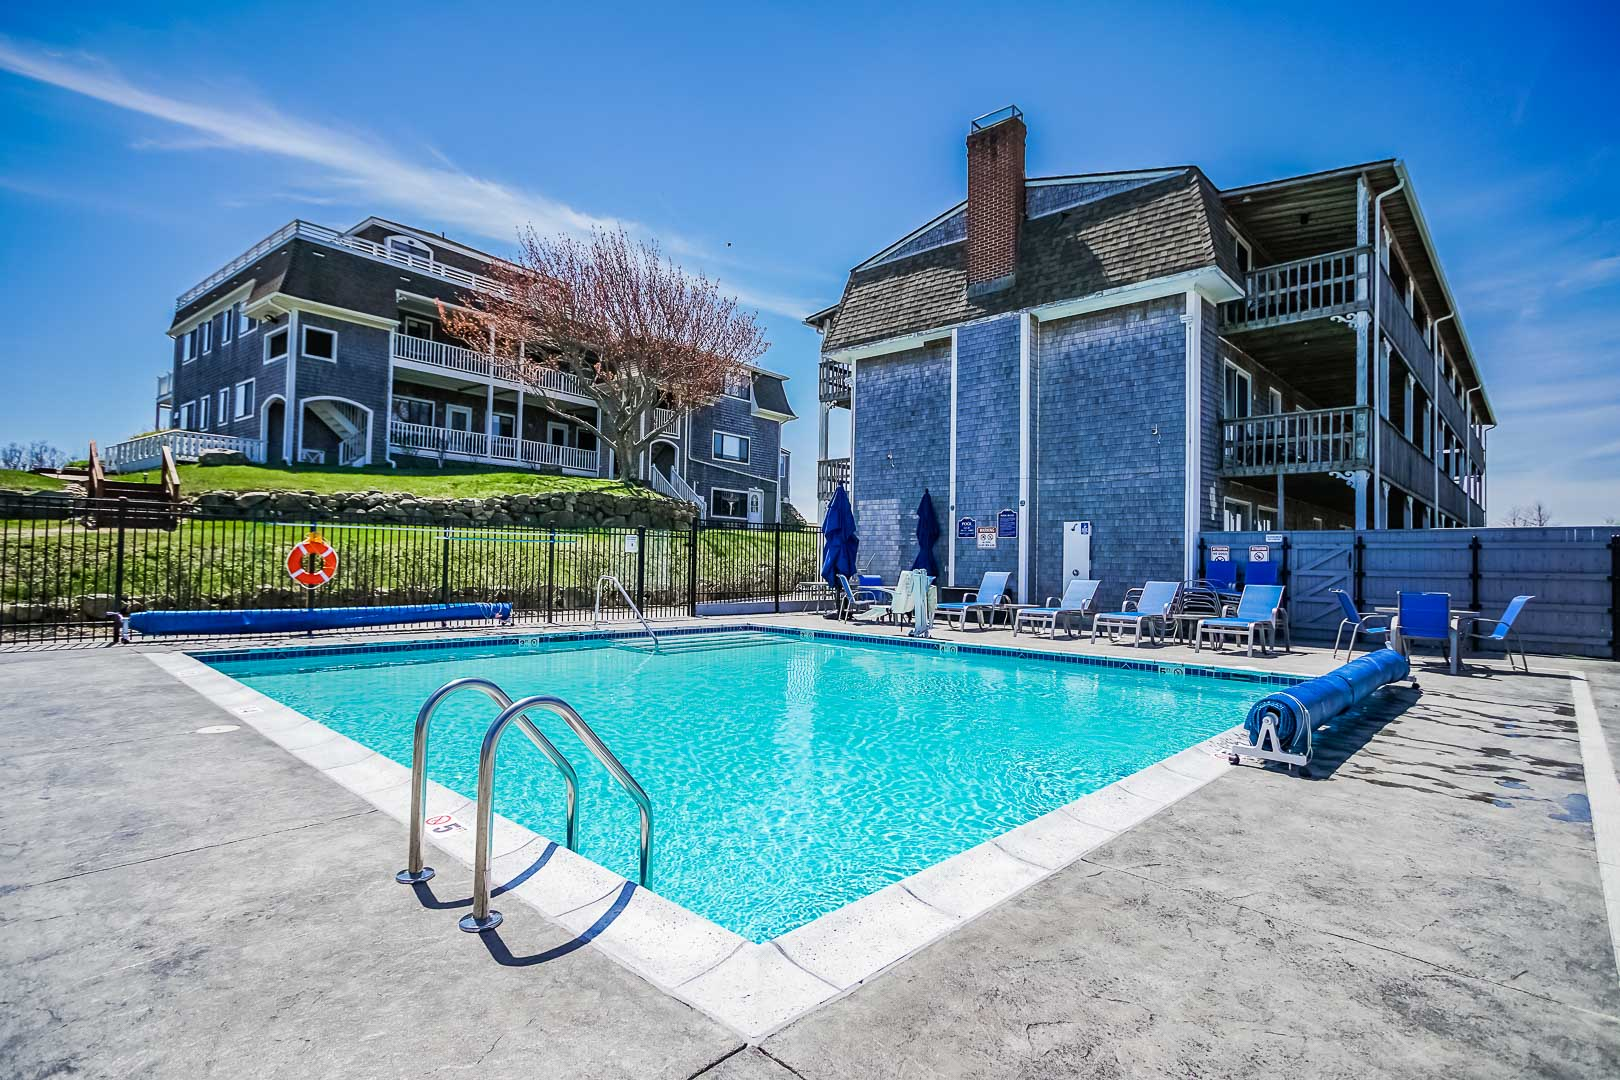 A crisp swimming pool at VRI's Neptune House Resort in Rhode Island.